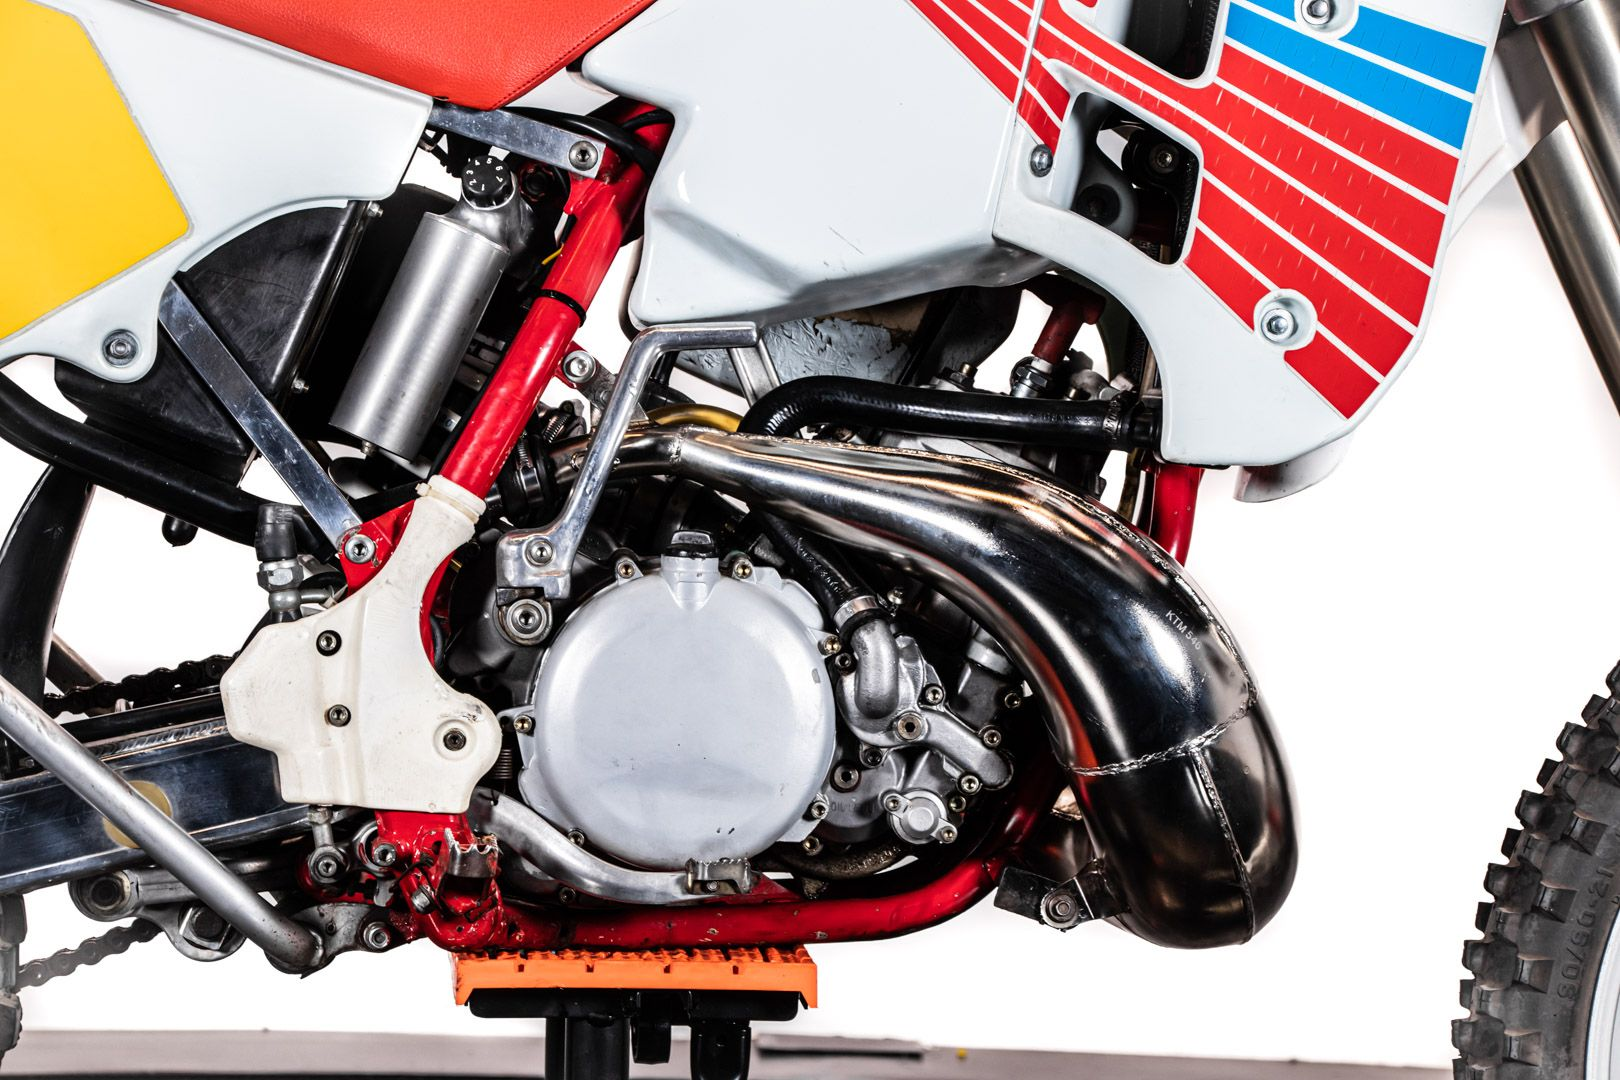 1991 KTM GS 250 82484